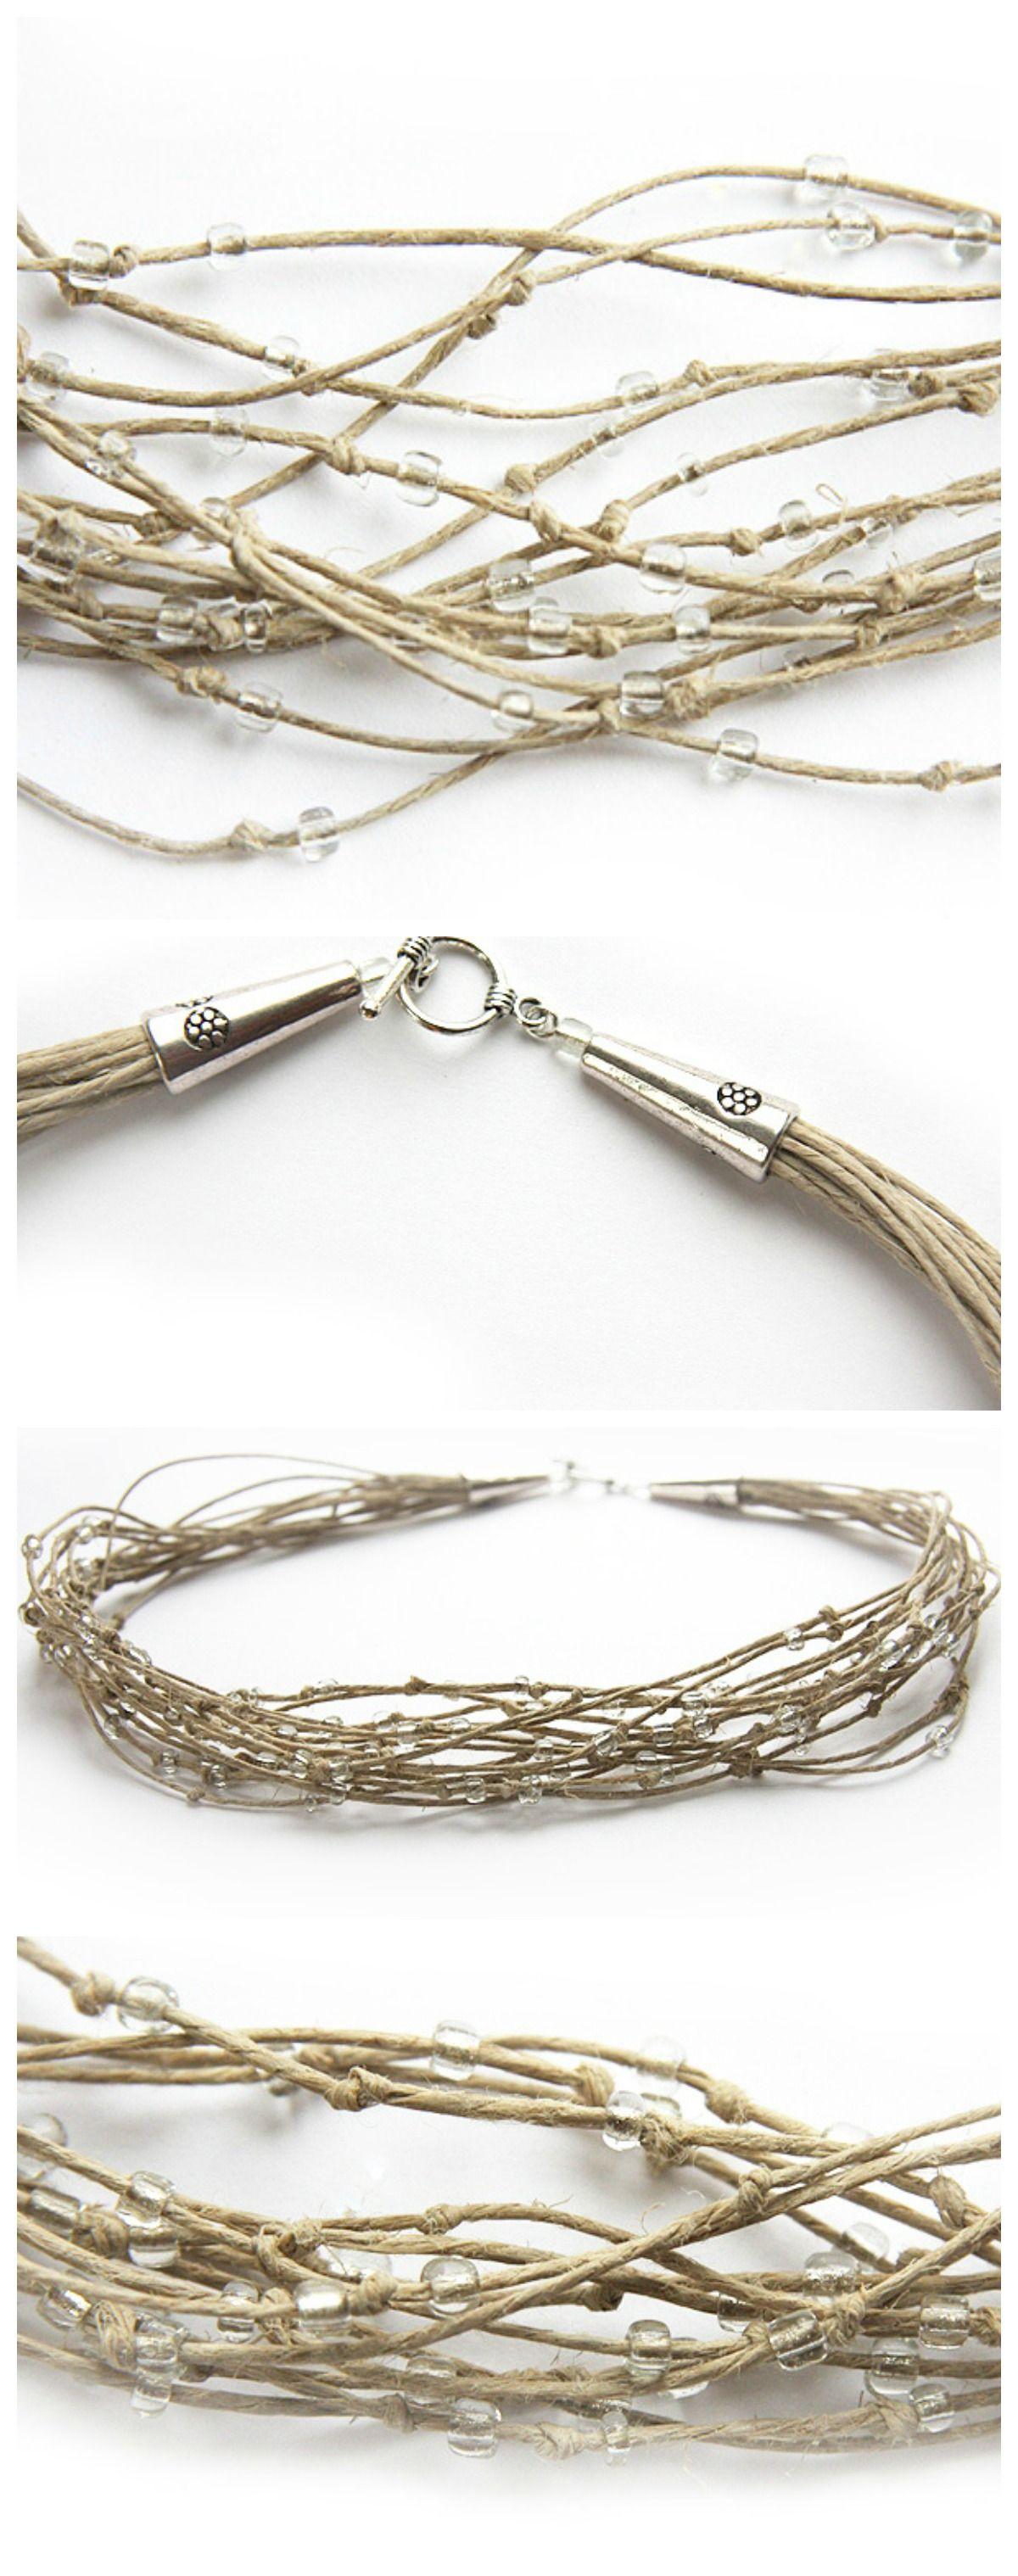 Eco Friendly Rustic Boho Necklace, Natural Polished Soft Hemp in Cream Shades. Multi Strand Necklace. Clear Beads. Bird Nest #boho